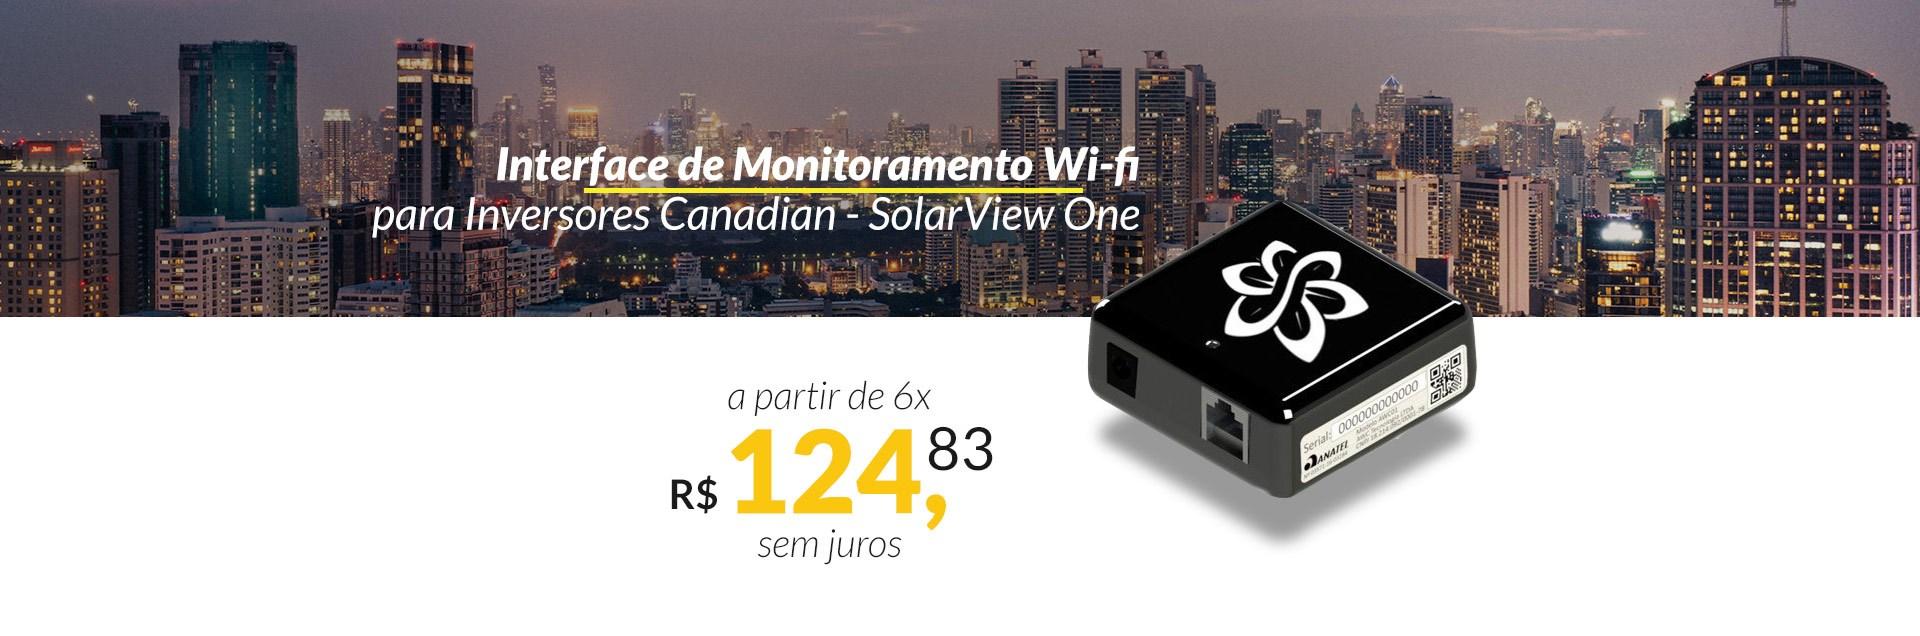 Interface de Monitoramento para Inversores Canadian Solar